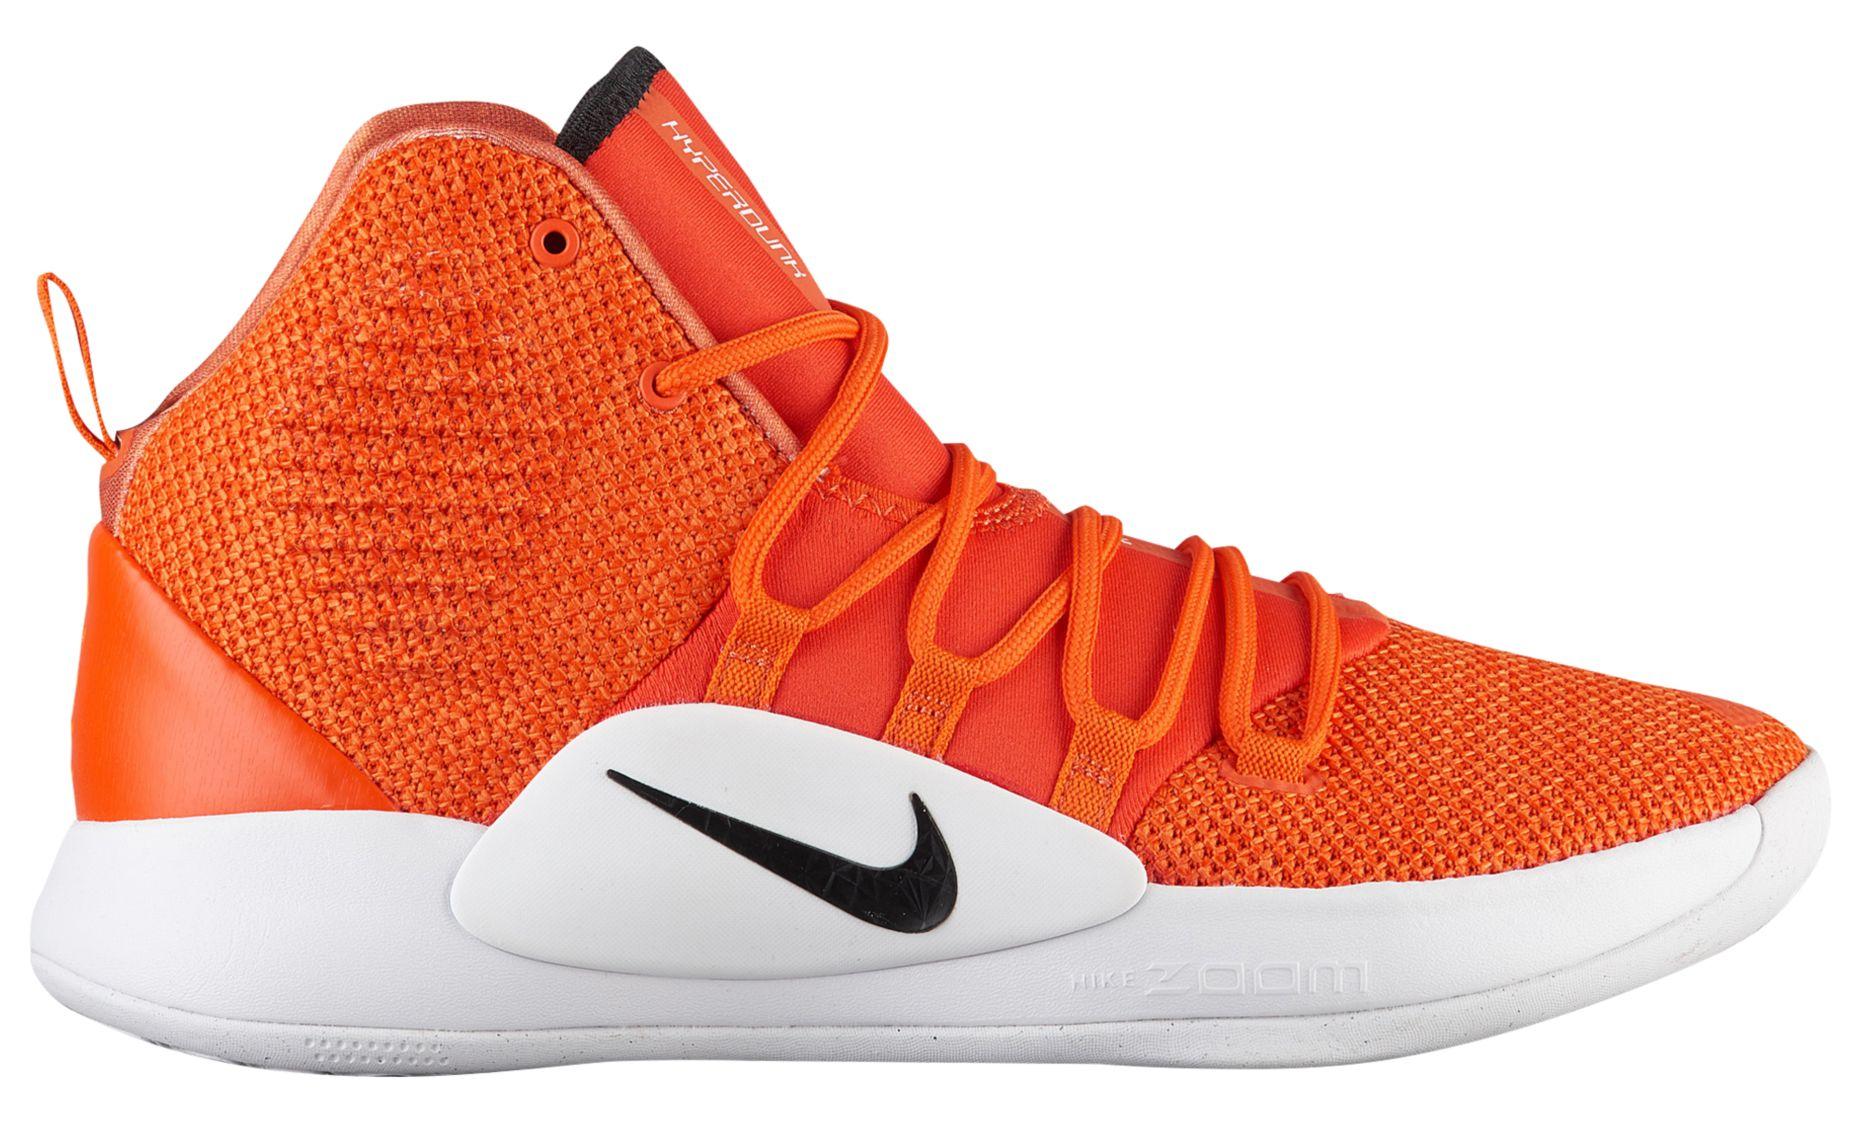 The 2018 Nike Hyperdunk X Finally Has a